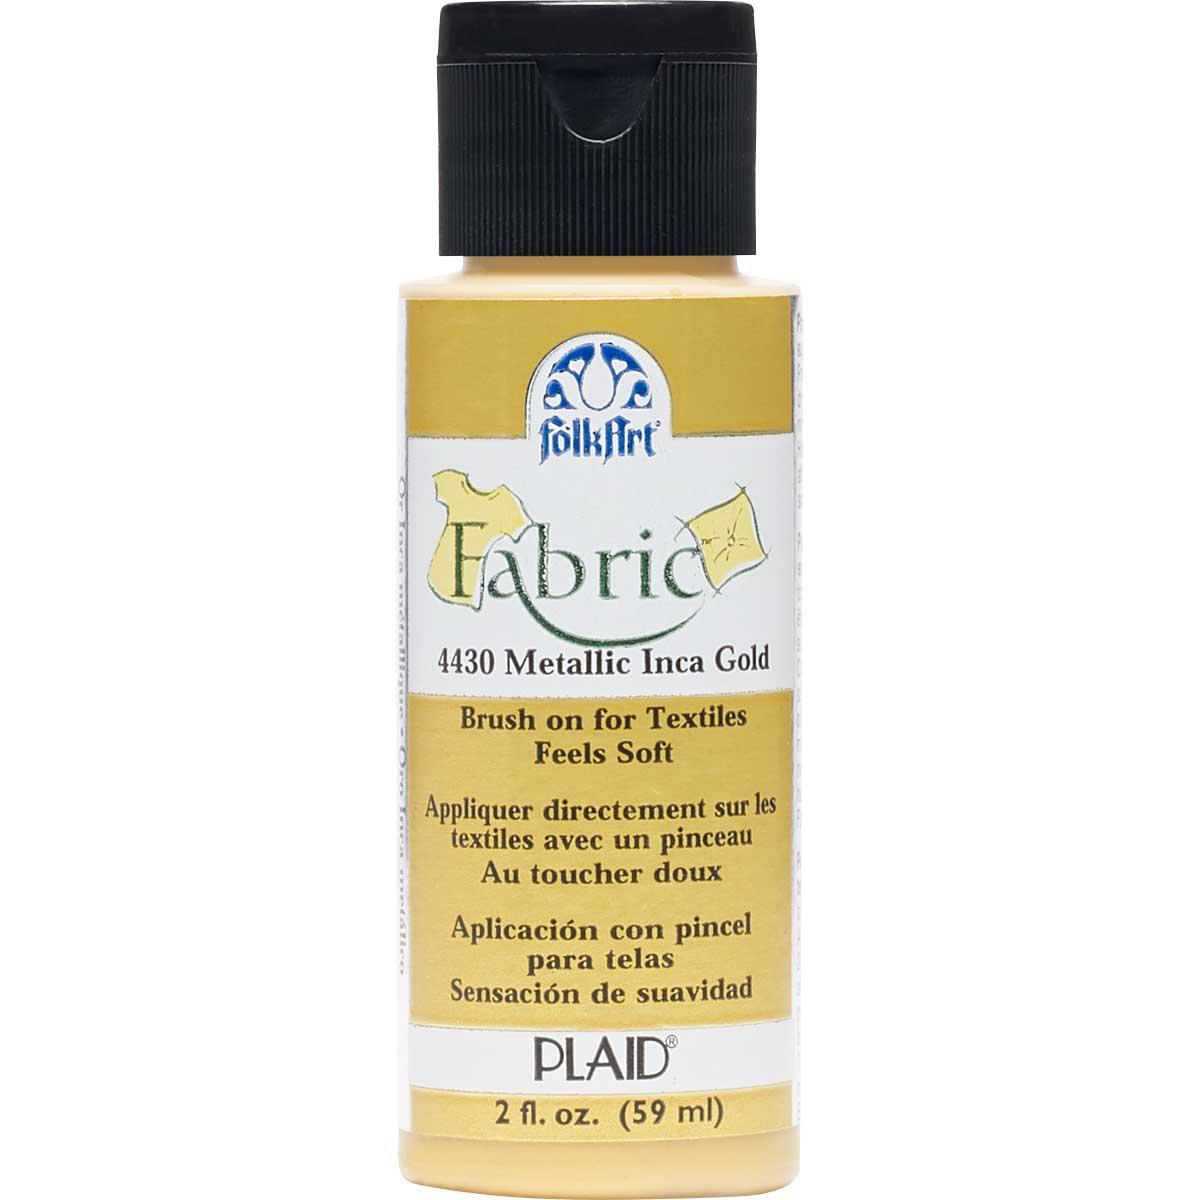 FolkArt ® Fabric™ Paint - Brush On - Metallic Inca Gold